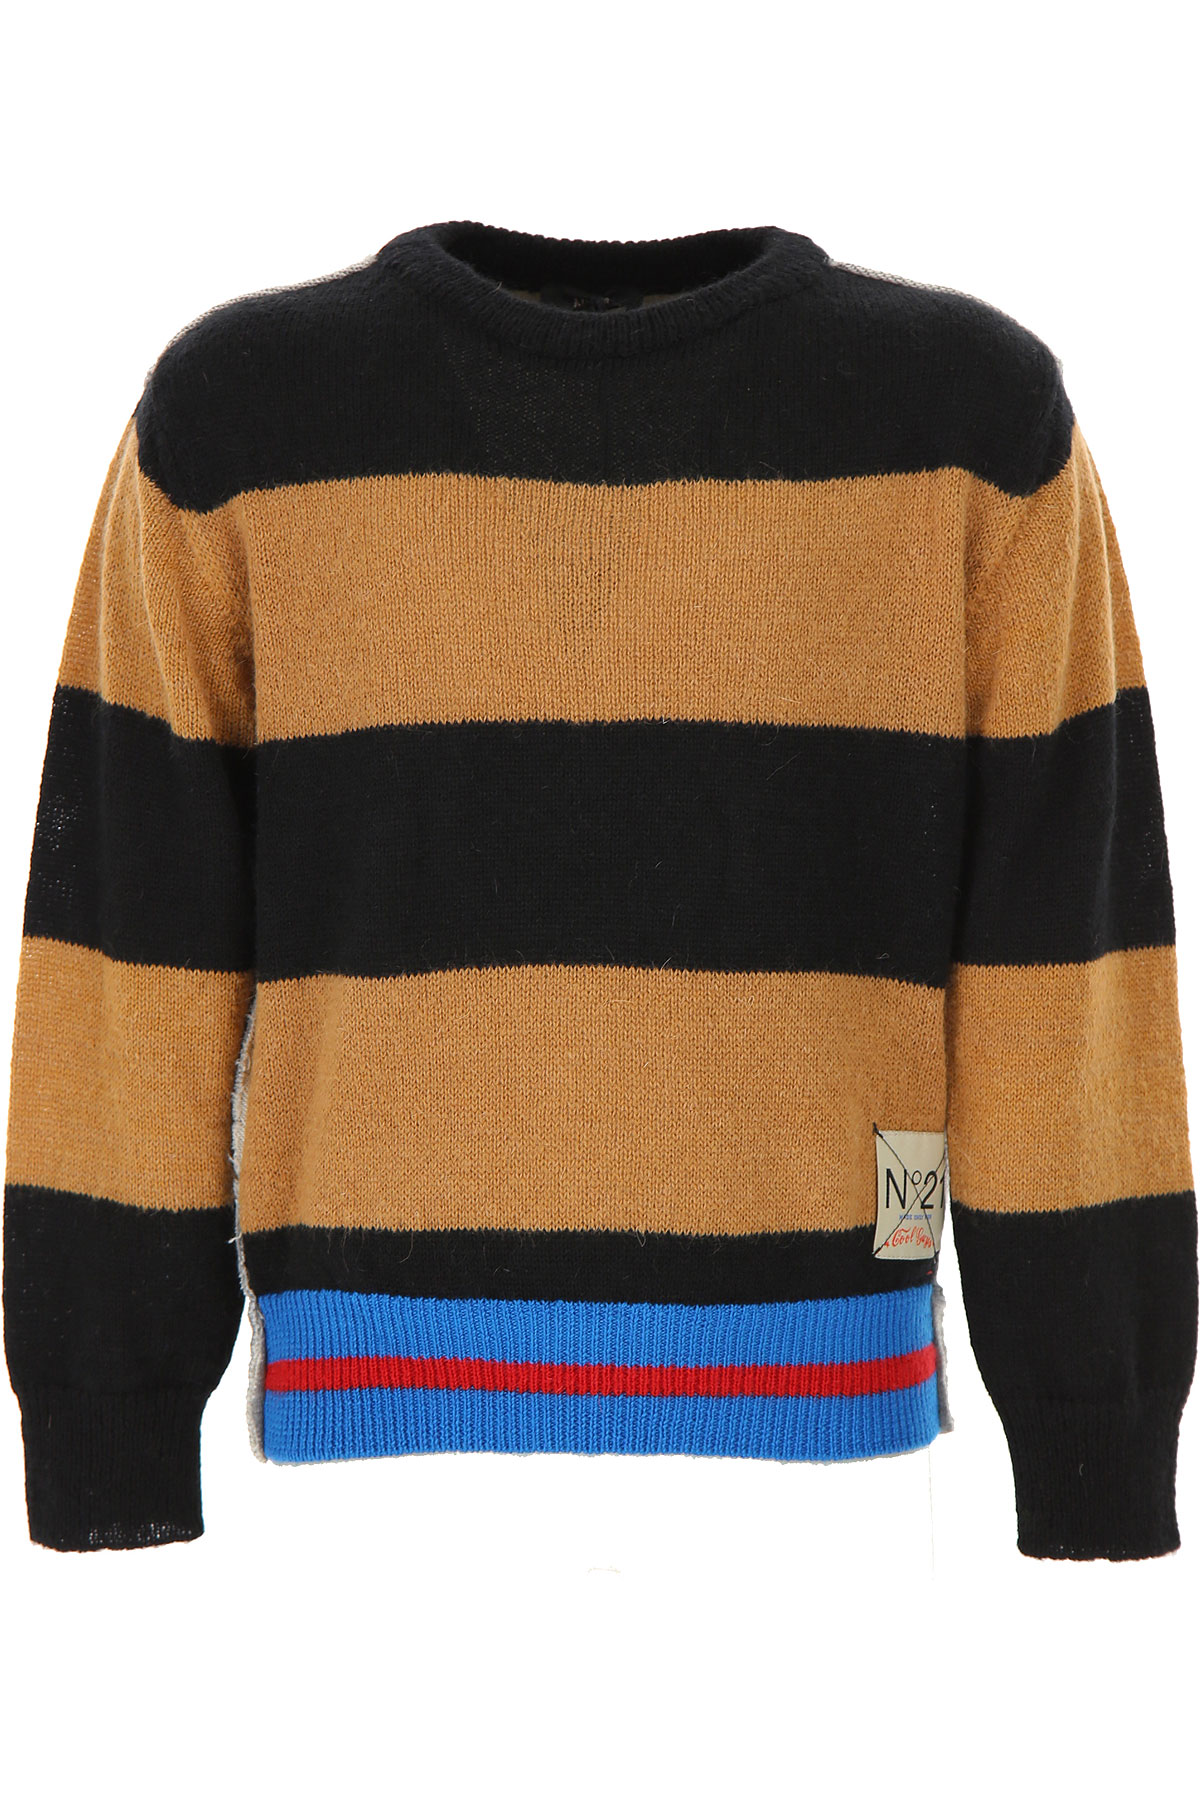 NO 21 Kids Sweaters for Boys On Sale, Black, Acrylic, 2019, 10Y 12Y 8Y